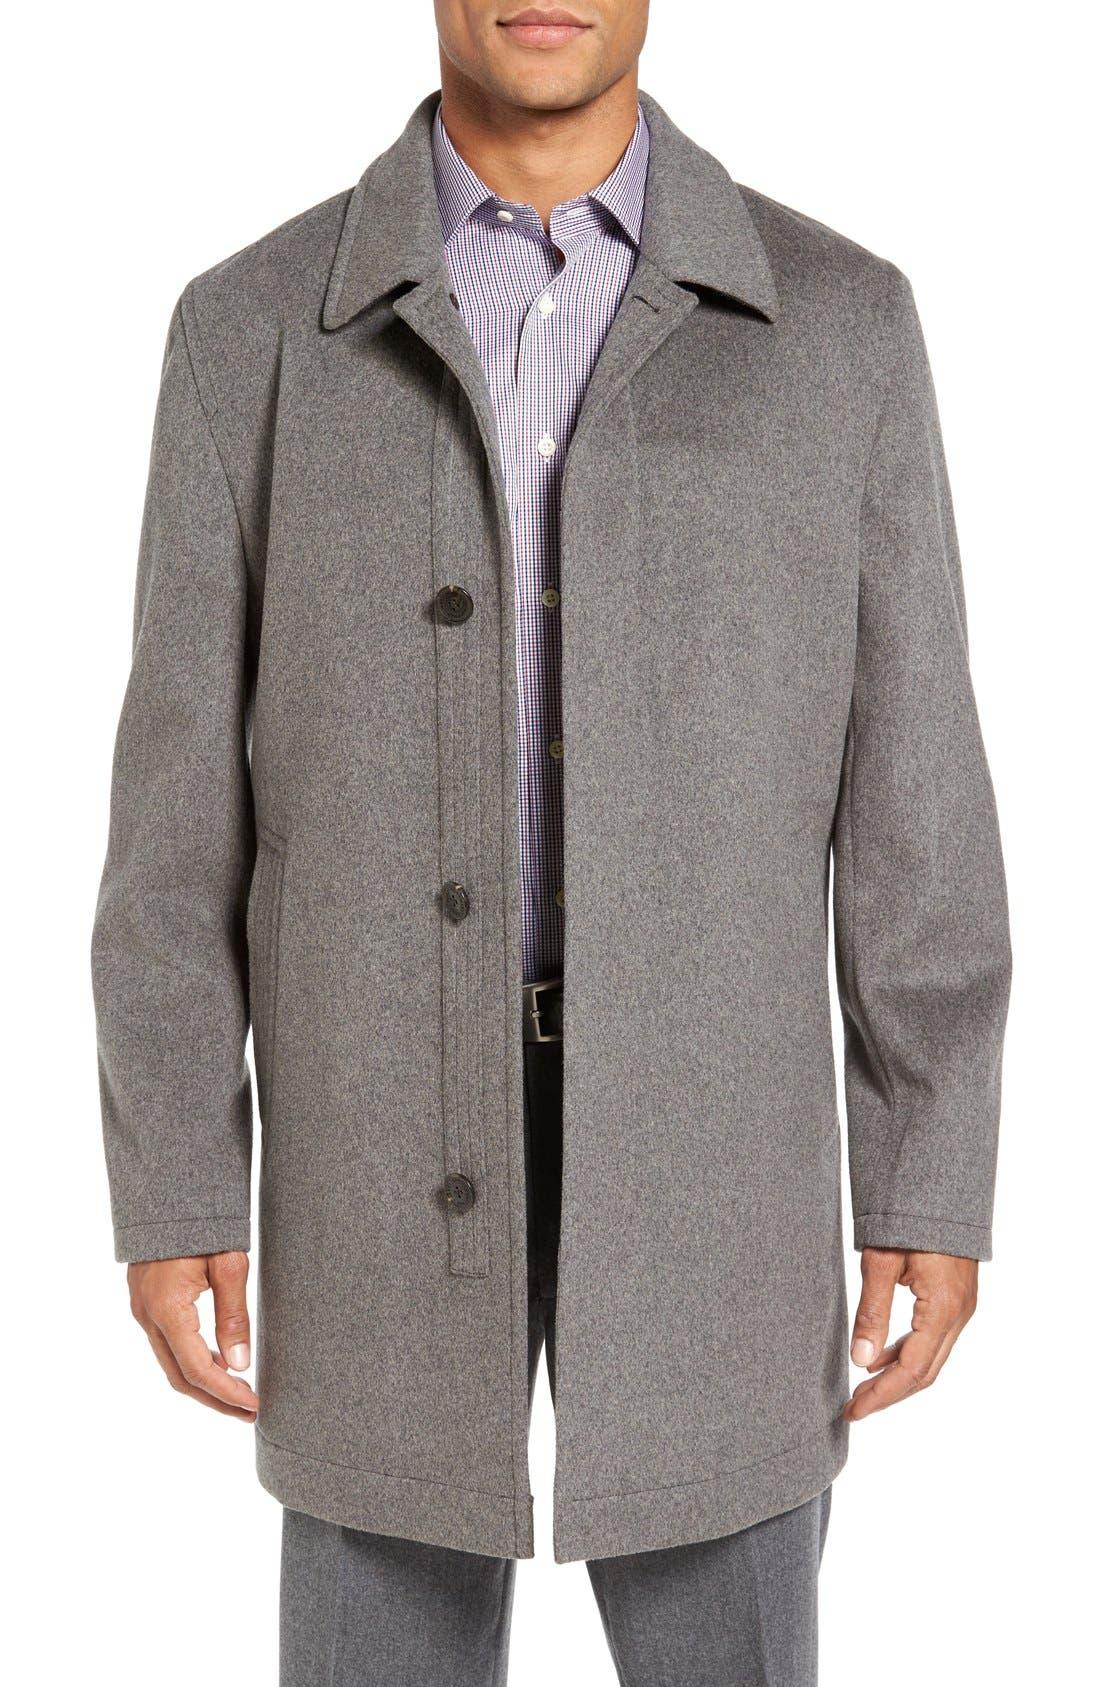 Douglas Modern Fit Wool & Cashmere Overcoat,                         Main,                         color, SMOKE